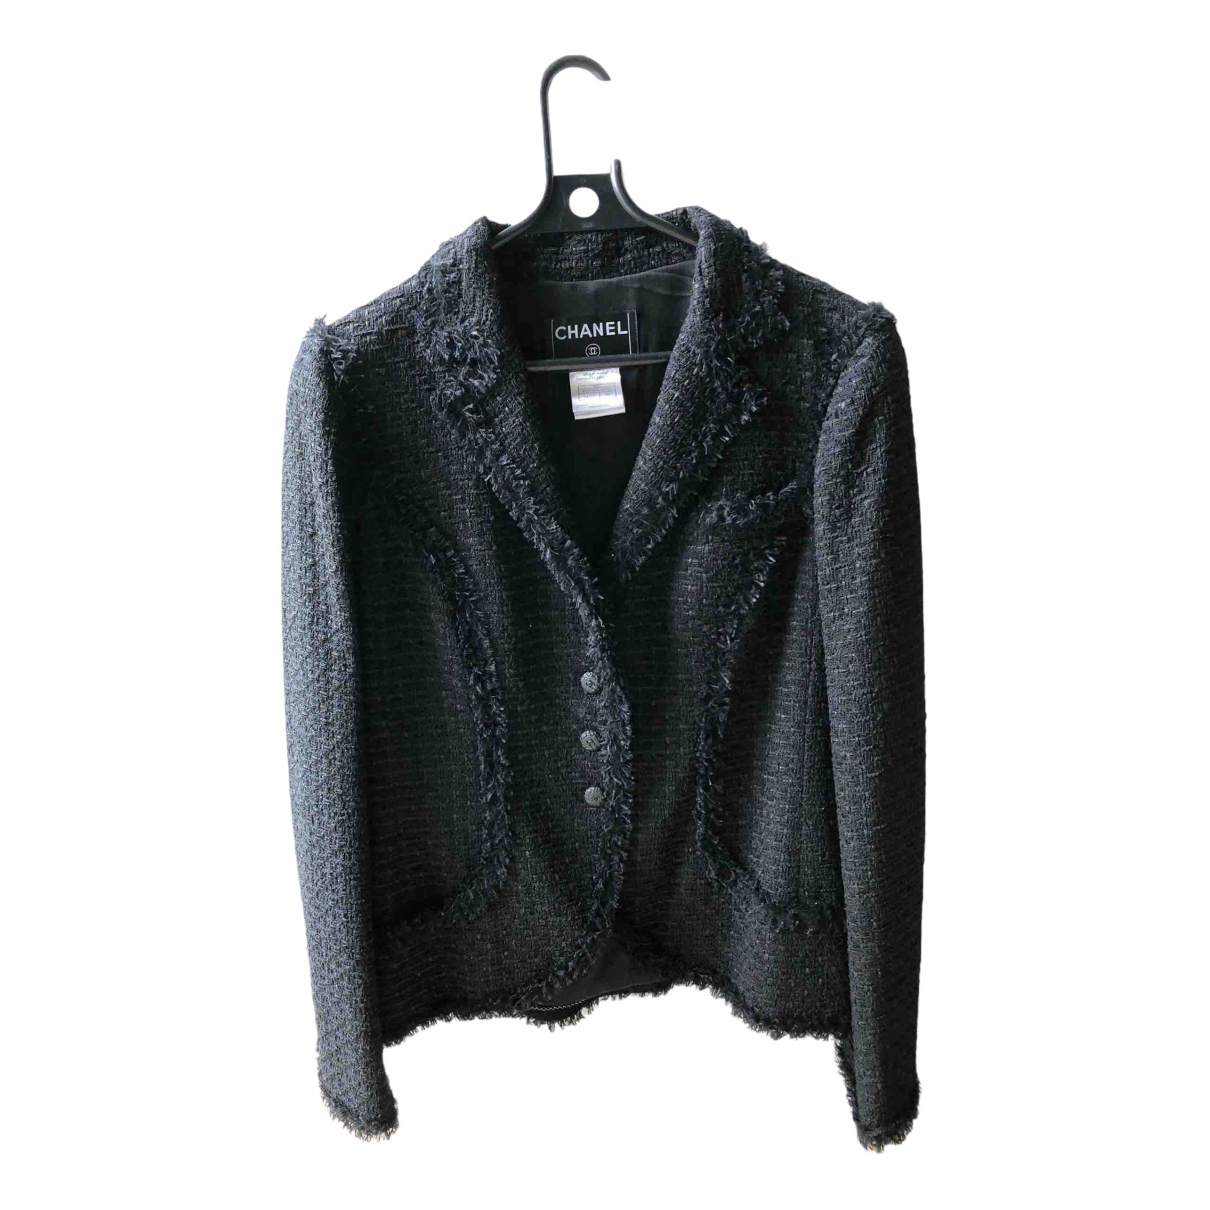 Chanel \N Black jacket for Women 44 FR